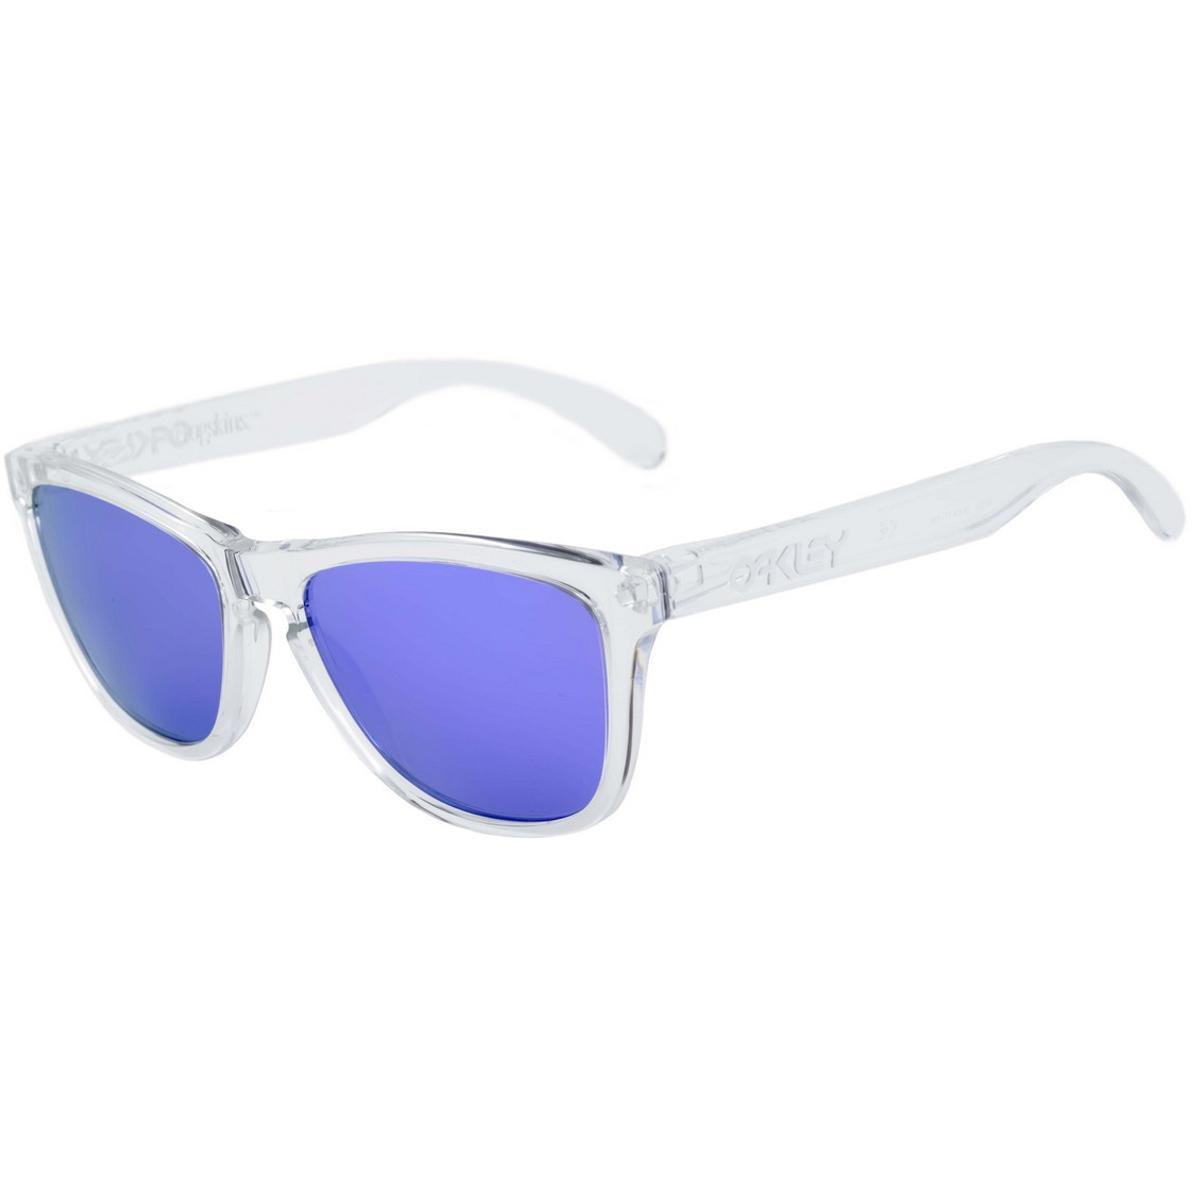 bf7d6bee4a5d4 Óculos Oakley Frogskins - Compre Agora